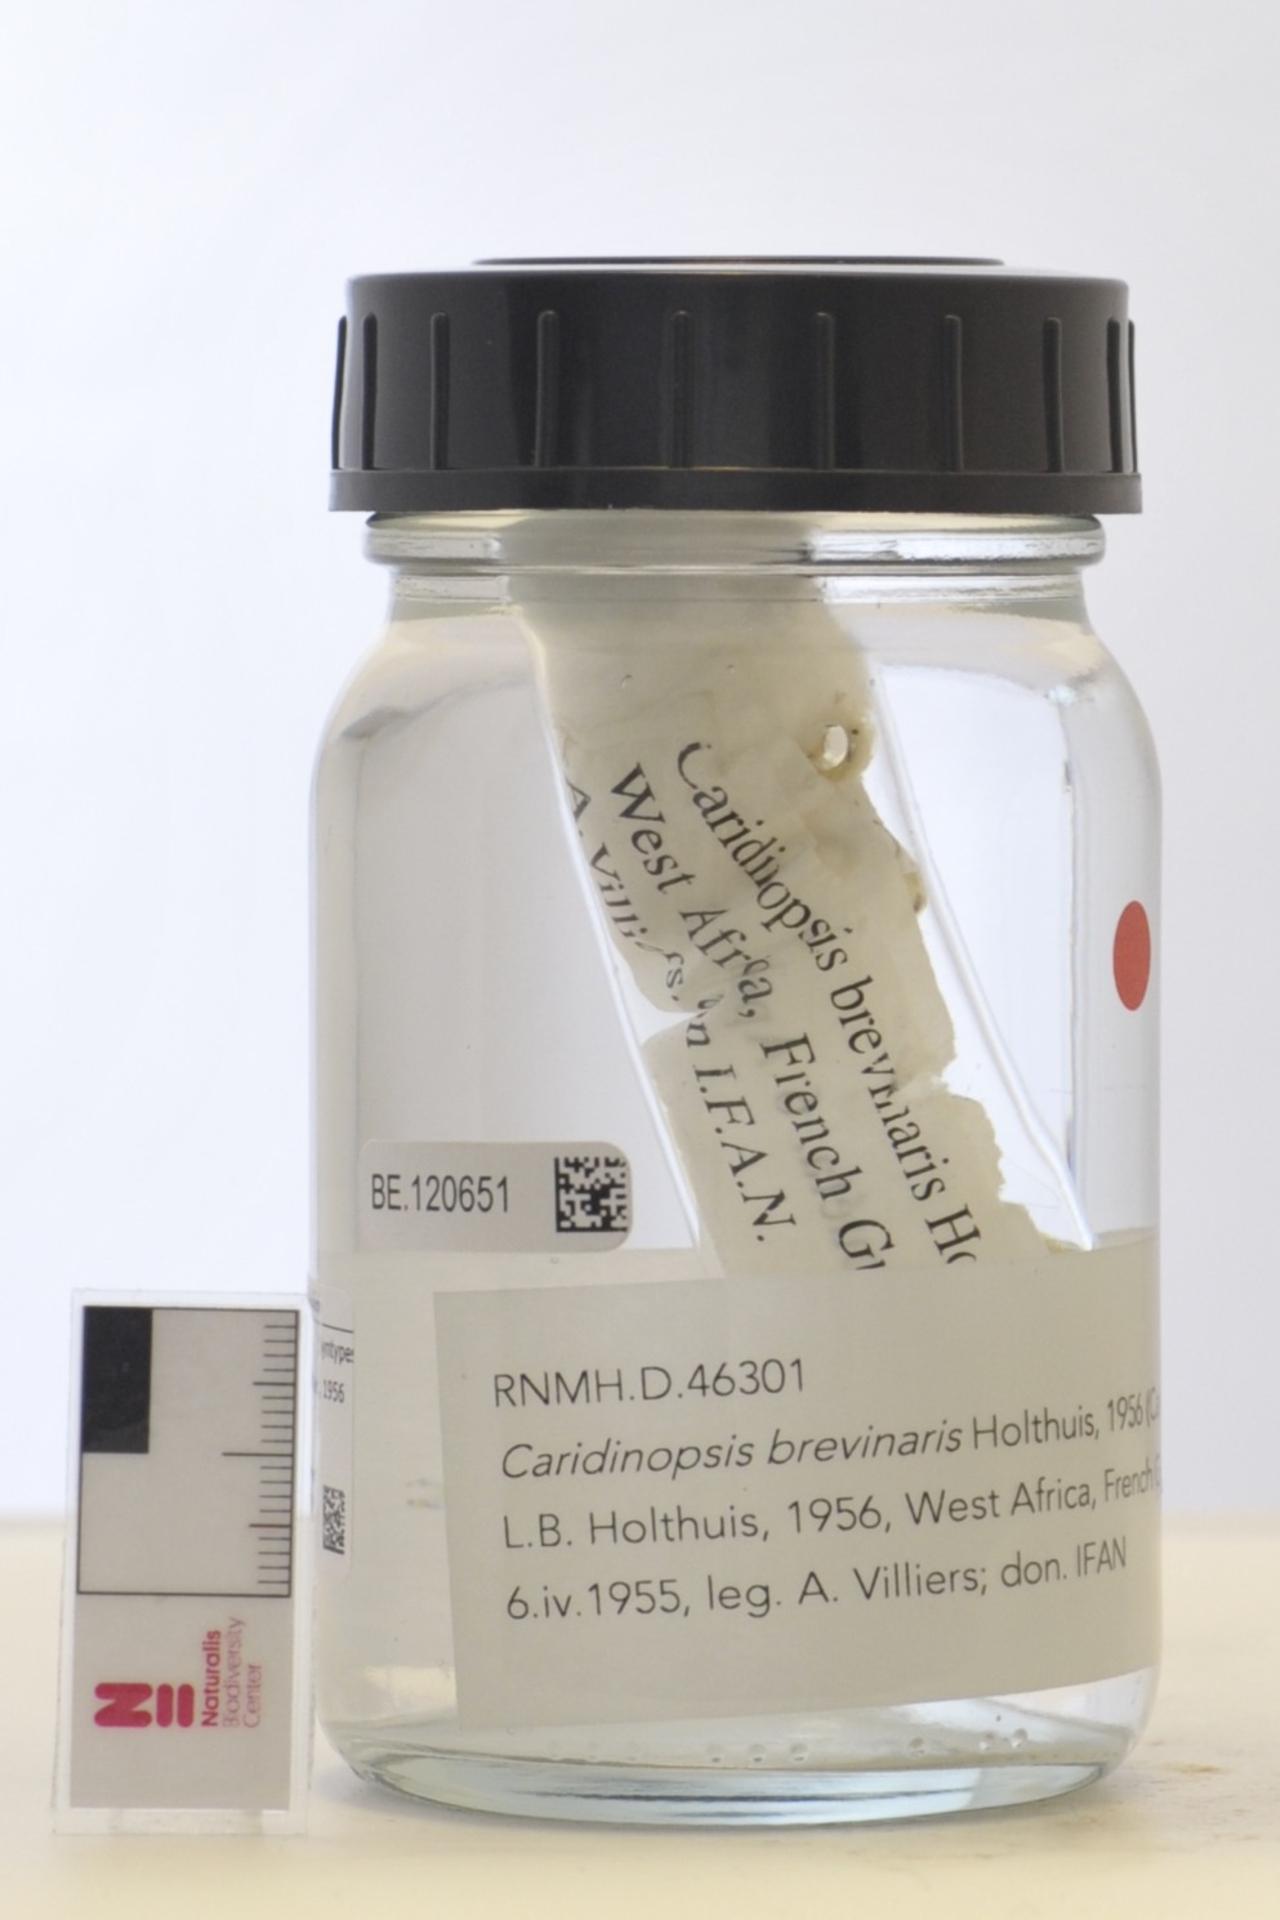 RMNH.CRUS.D.46301 | Caridinopsis brevinaris Holthuis, 1956